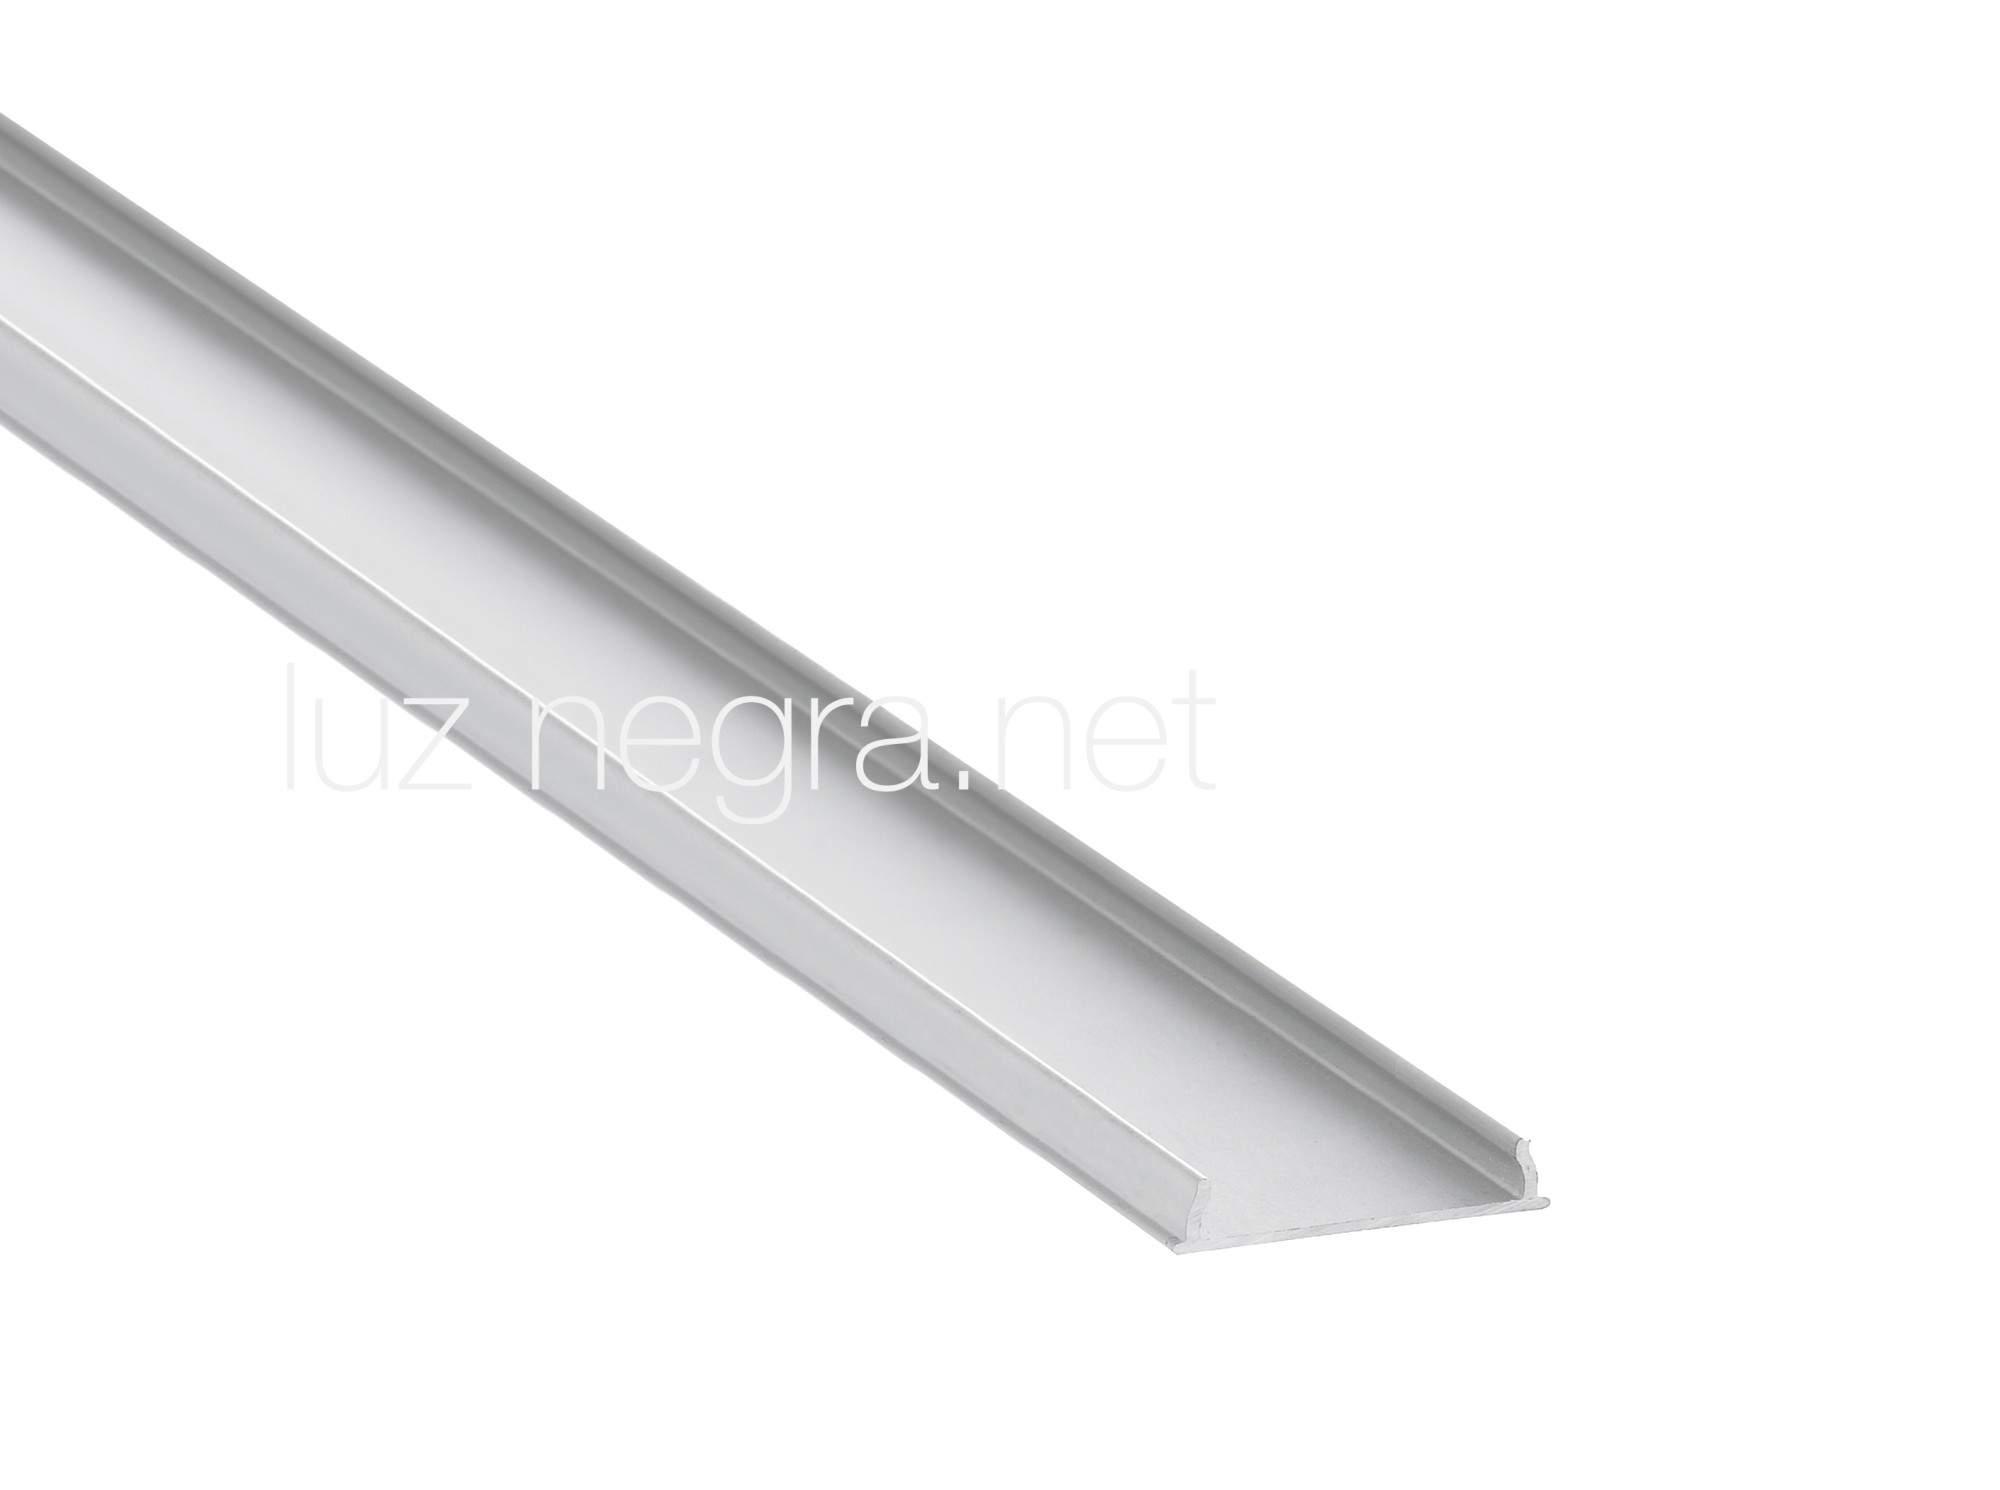 Alumiiniprofiili Alumiiniprofiili LUZ NEGRA Harmony 3m hopea